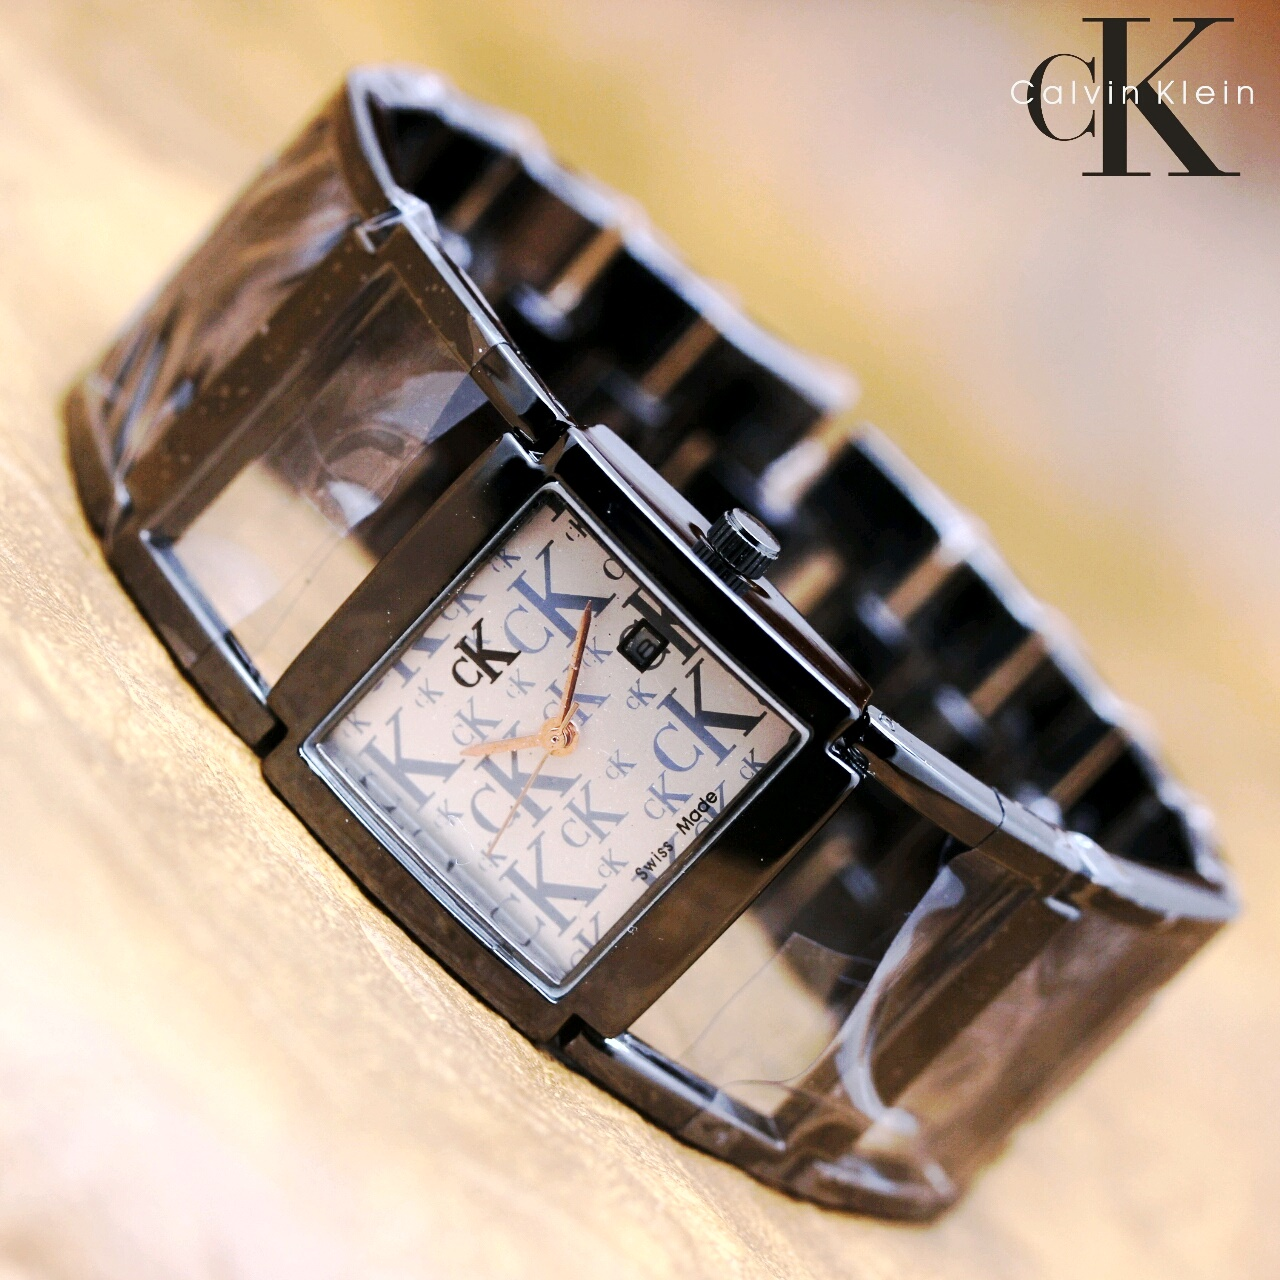 Jam Tangan Wanita Calvin Klein 020 Semi Premium + Box Kancing